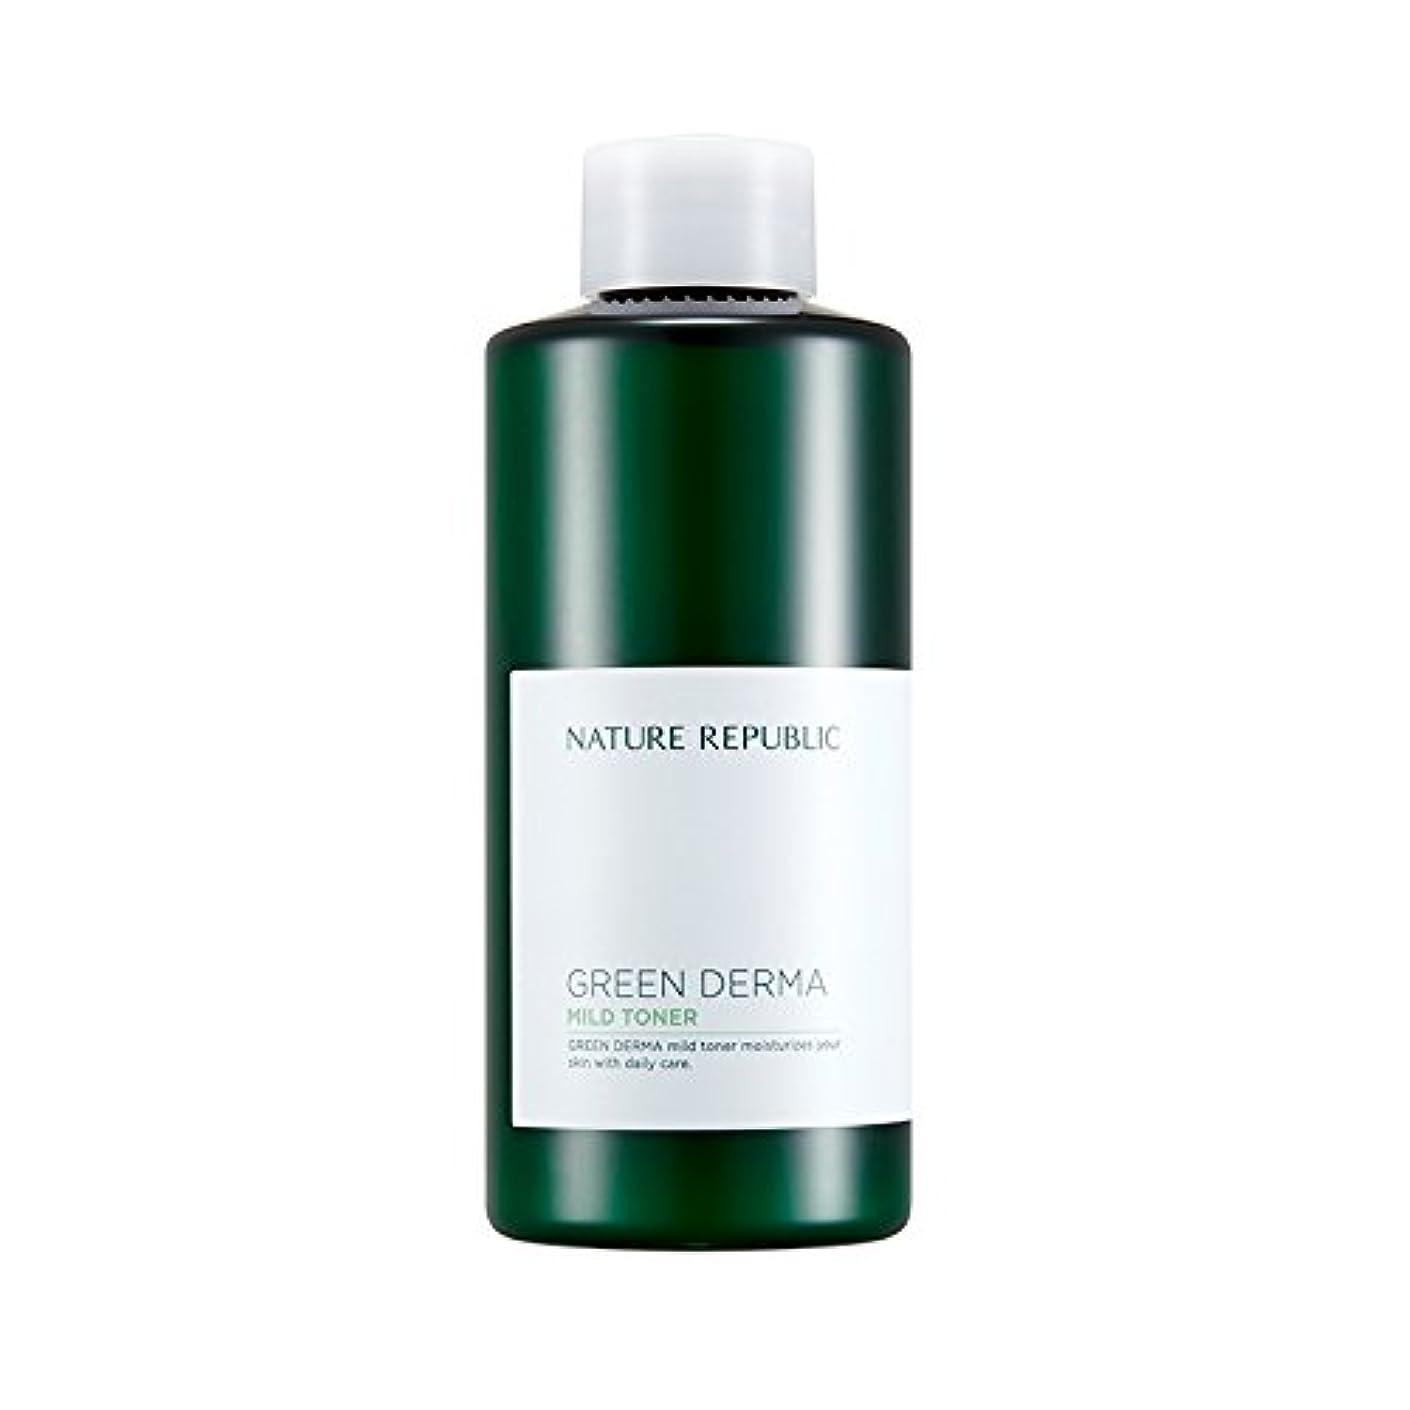 NATURE REPUBLIC Green Derma Mild Toner / ネイチャーリパブリック グリーンダーママイルドトナー 200ml [並行輸入品]